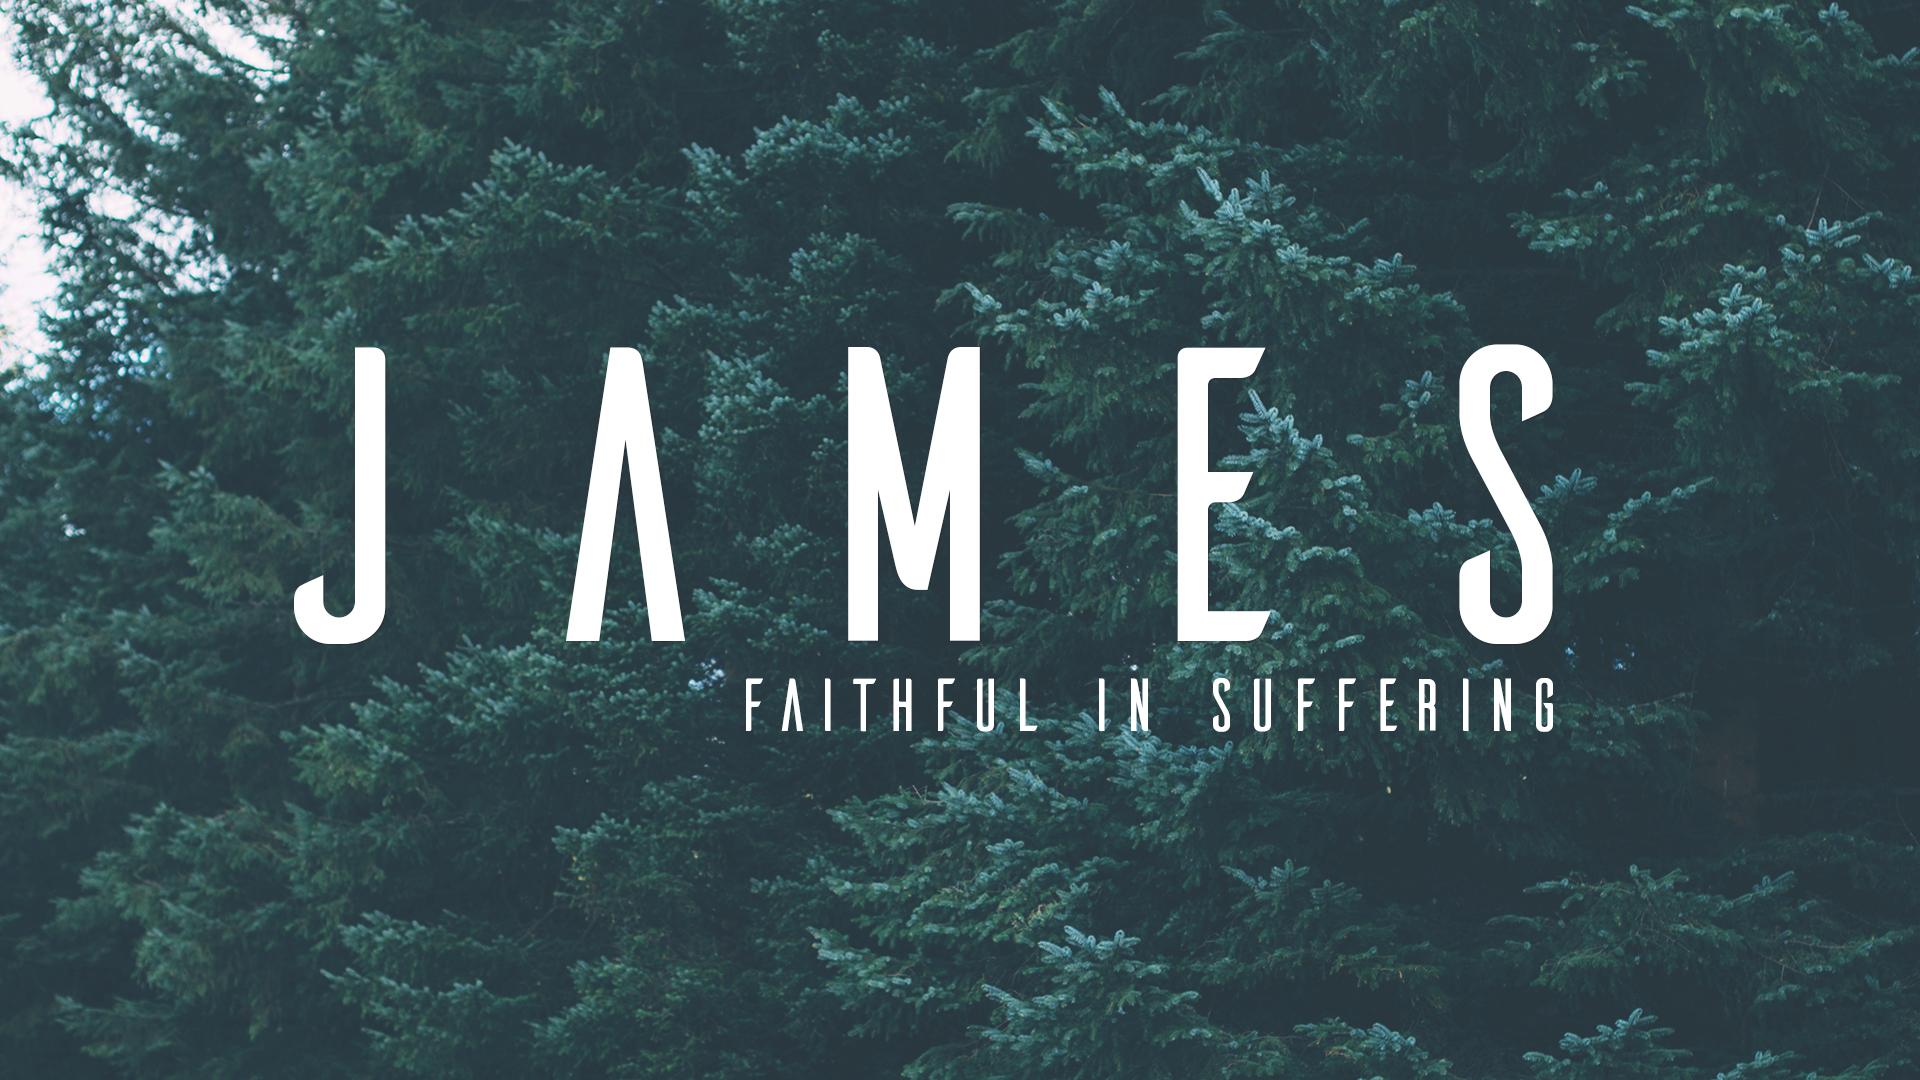 JAMES-A3.jpg